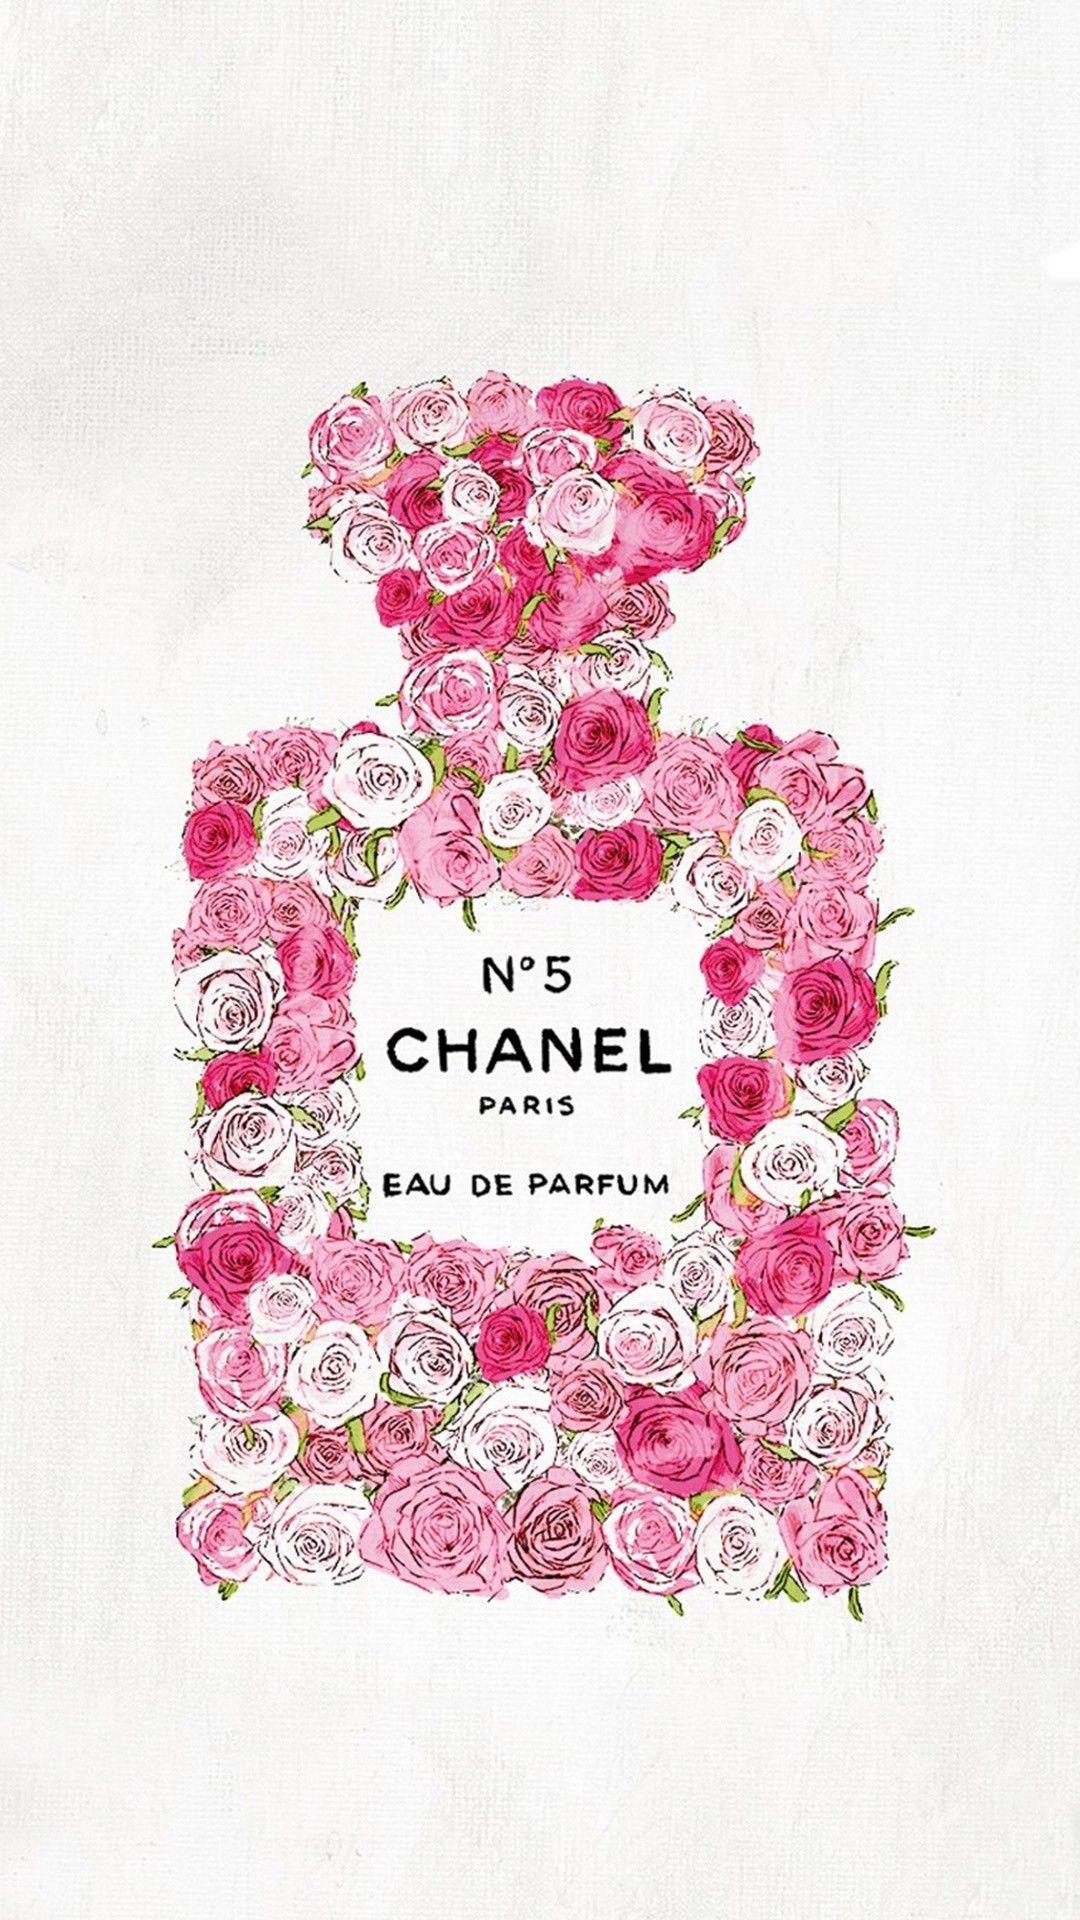 1080x1920 Chanel Na 5 Chanel アート 壁紙 シャネル 香水